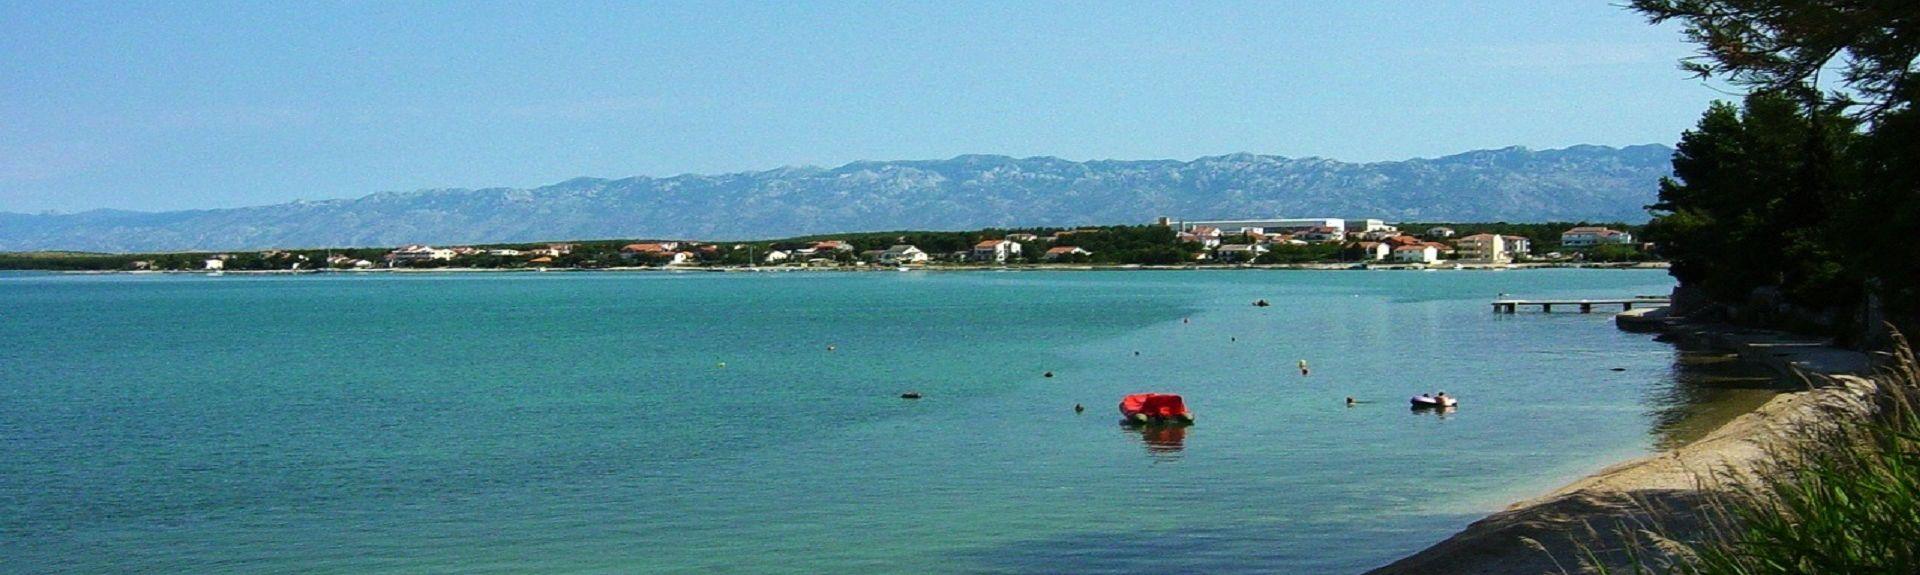 Povljana, Zadarin piirikunta, Kroatia